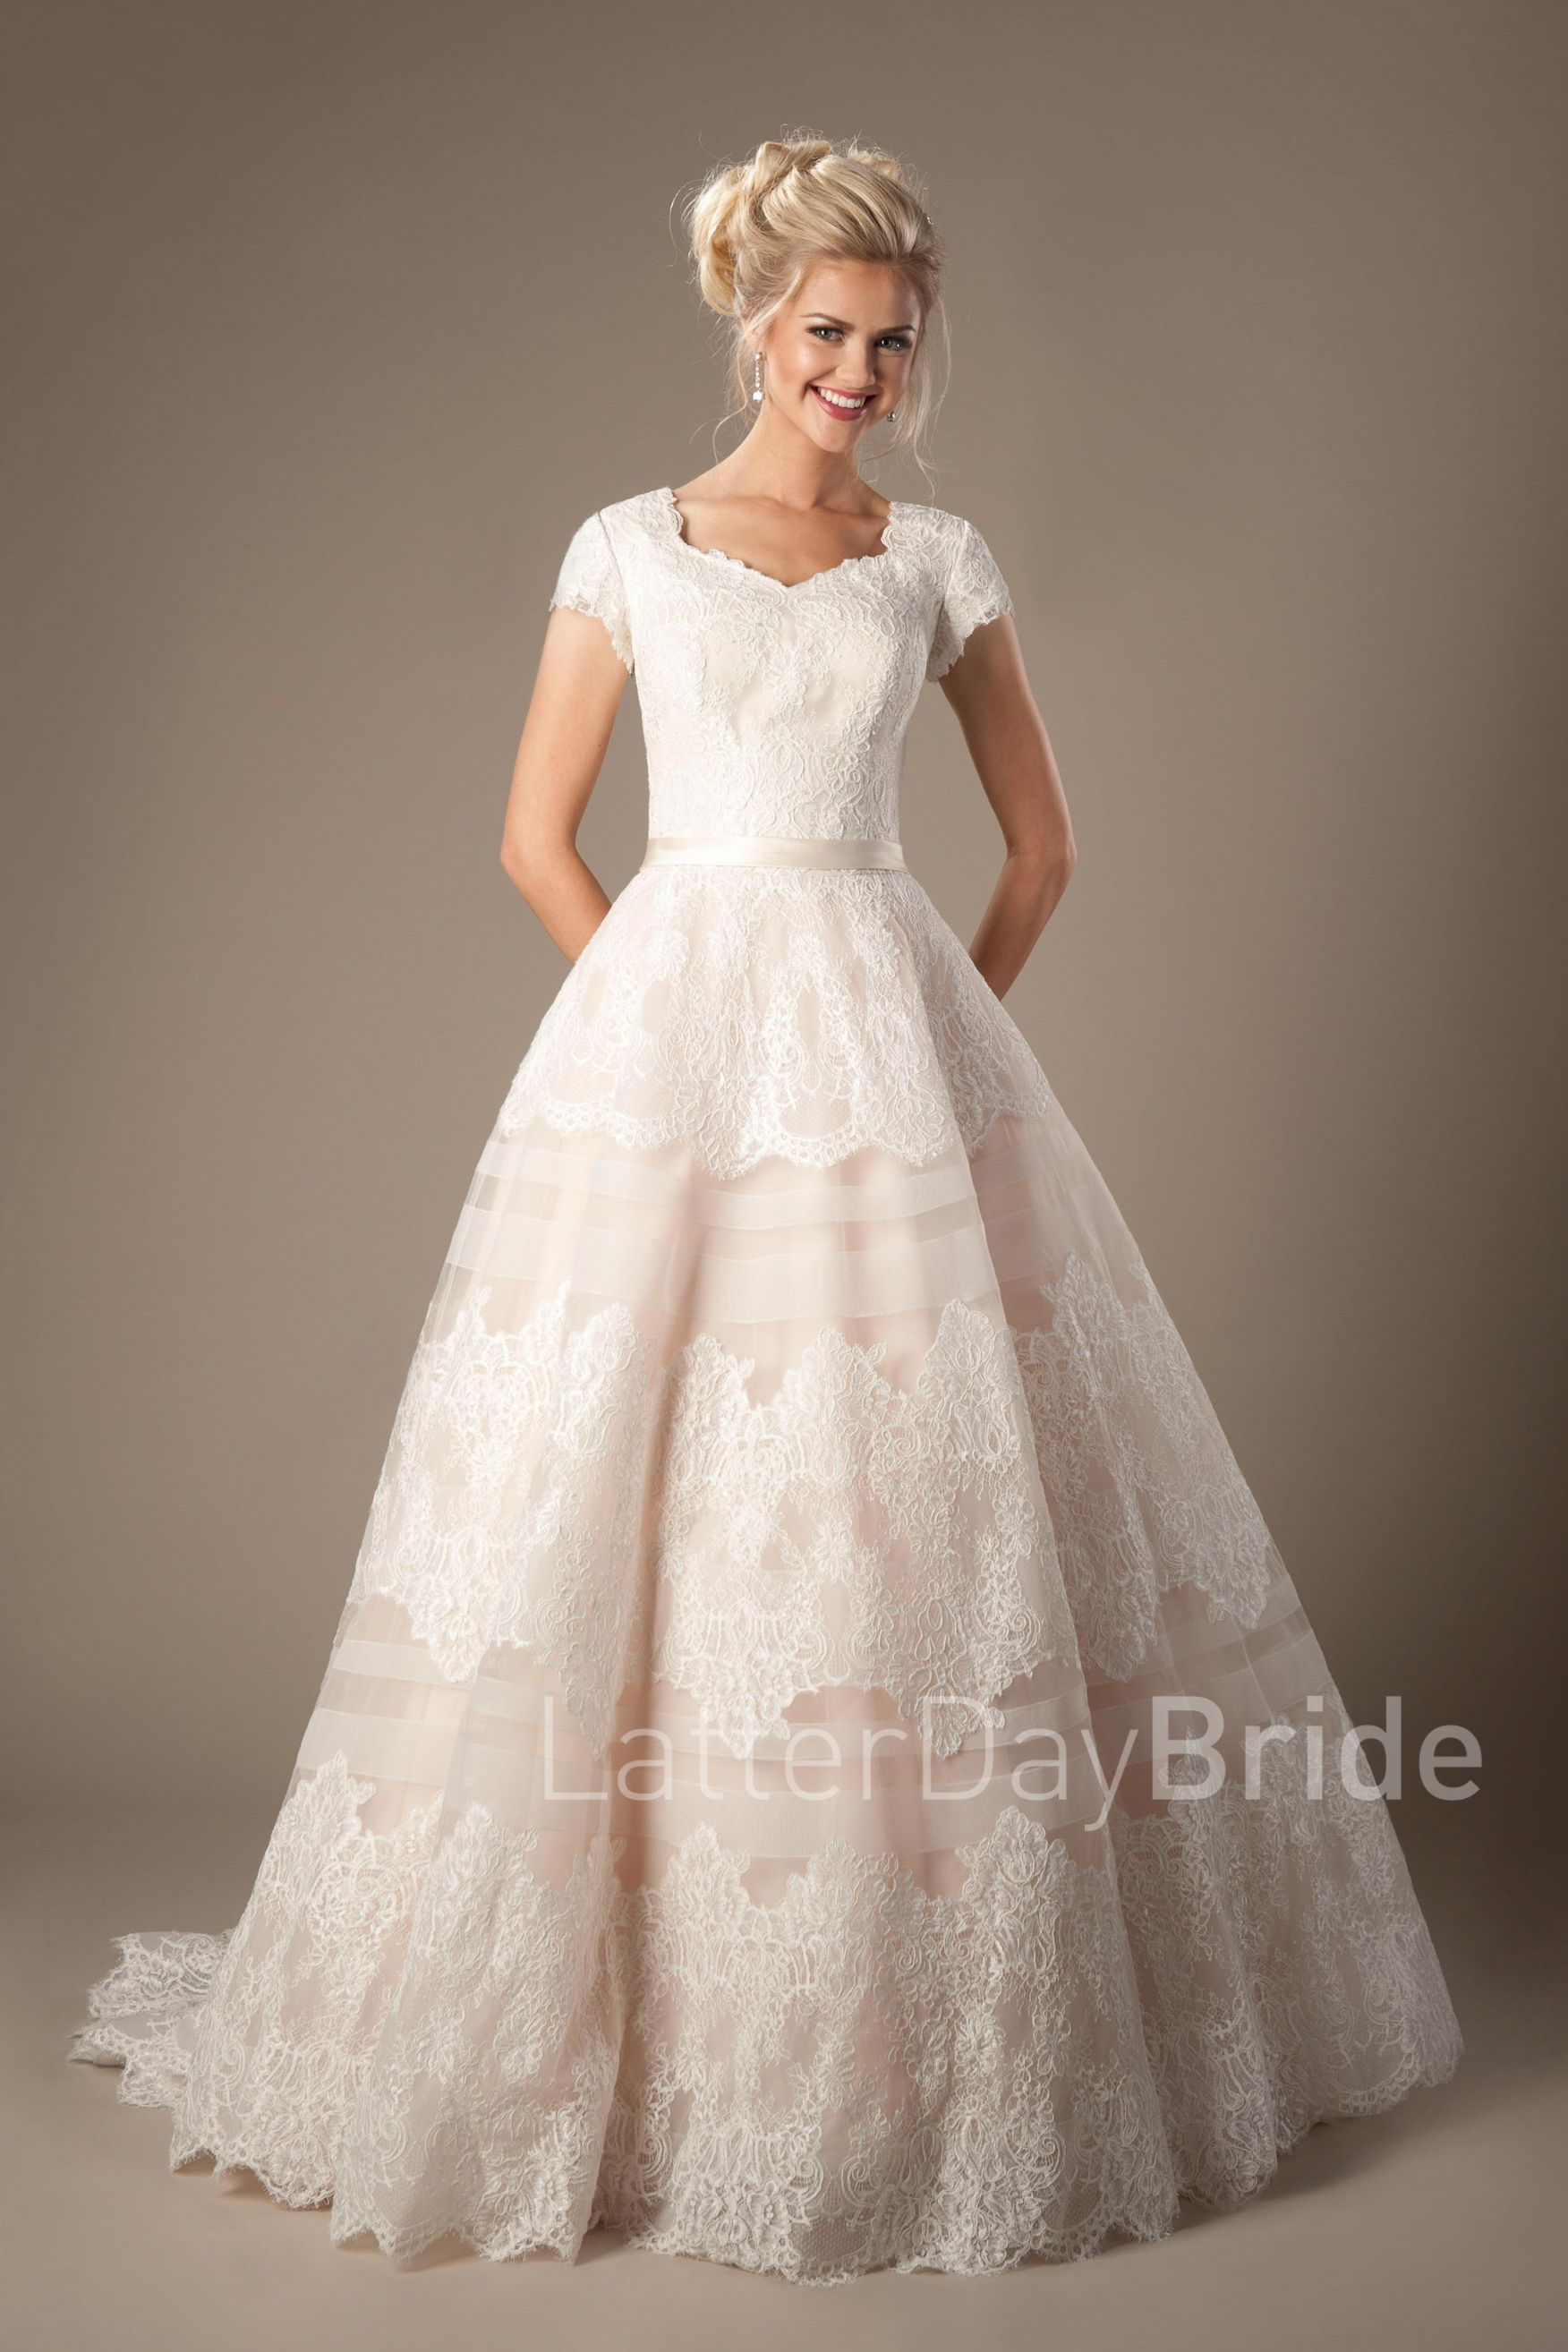 Rosetta | Modest Lace Wedding Dress with Sleeves | LatterDayBride ...